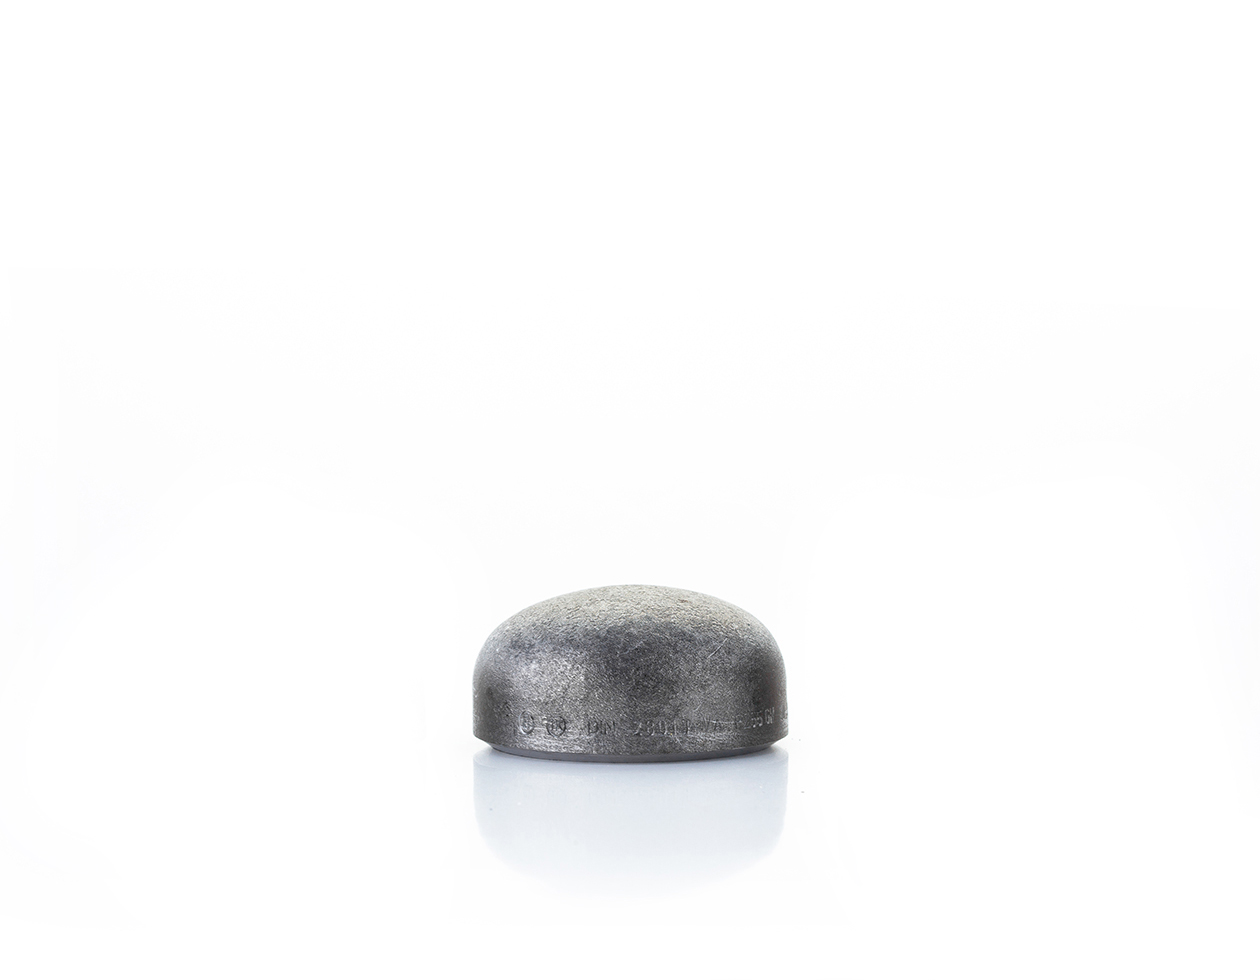 ELLIPSOIDAL CAPS ACC. TO DIN 28013, PN 64/M-35411, PN 75/M-35412